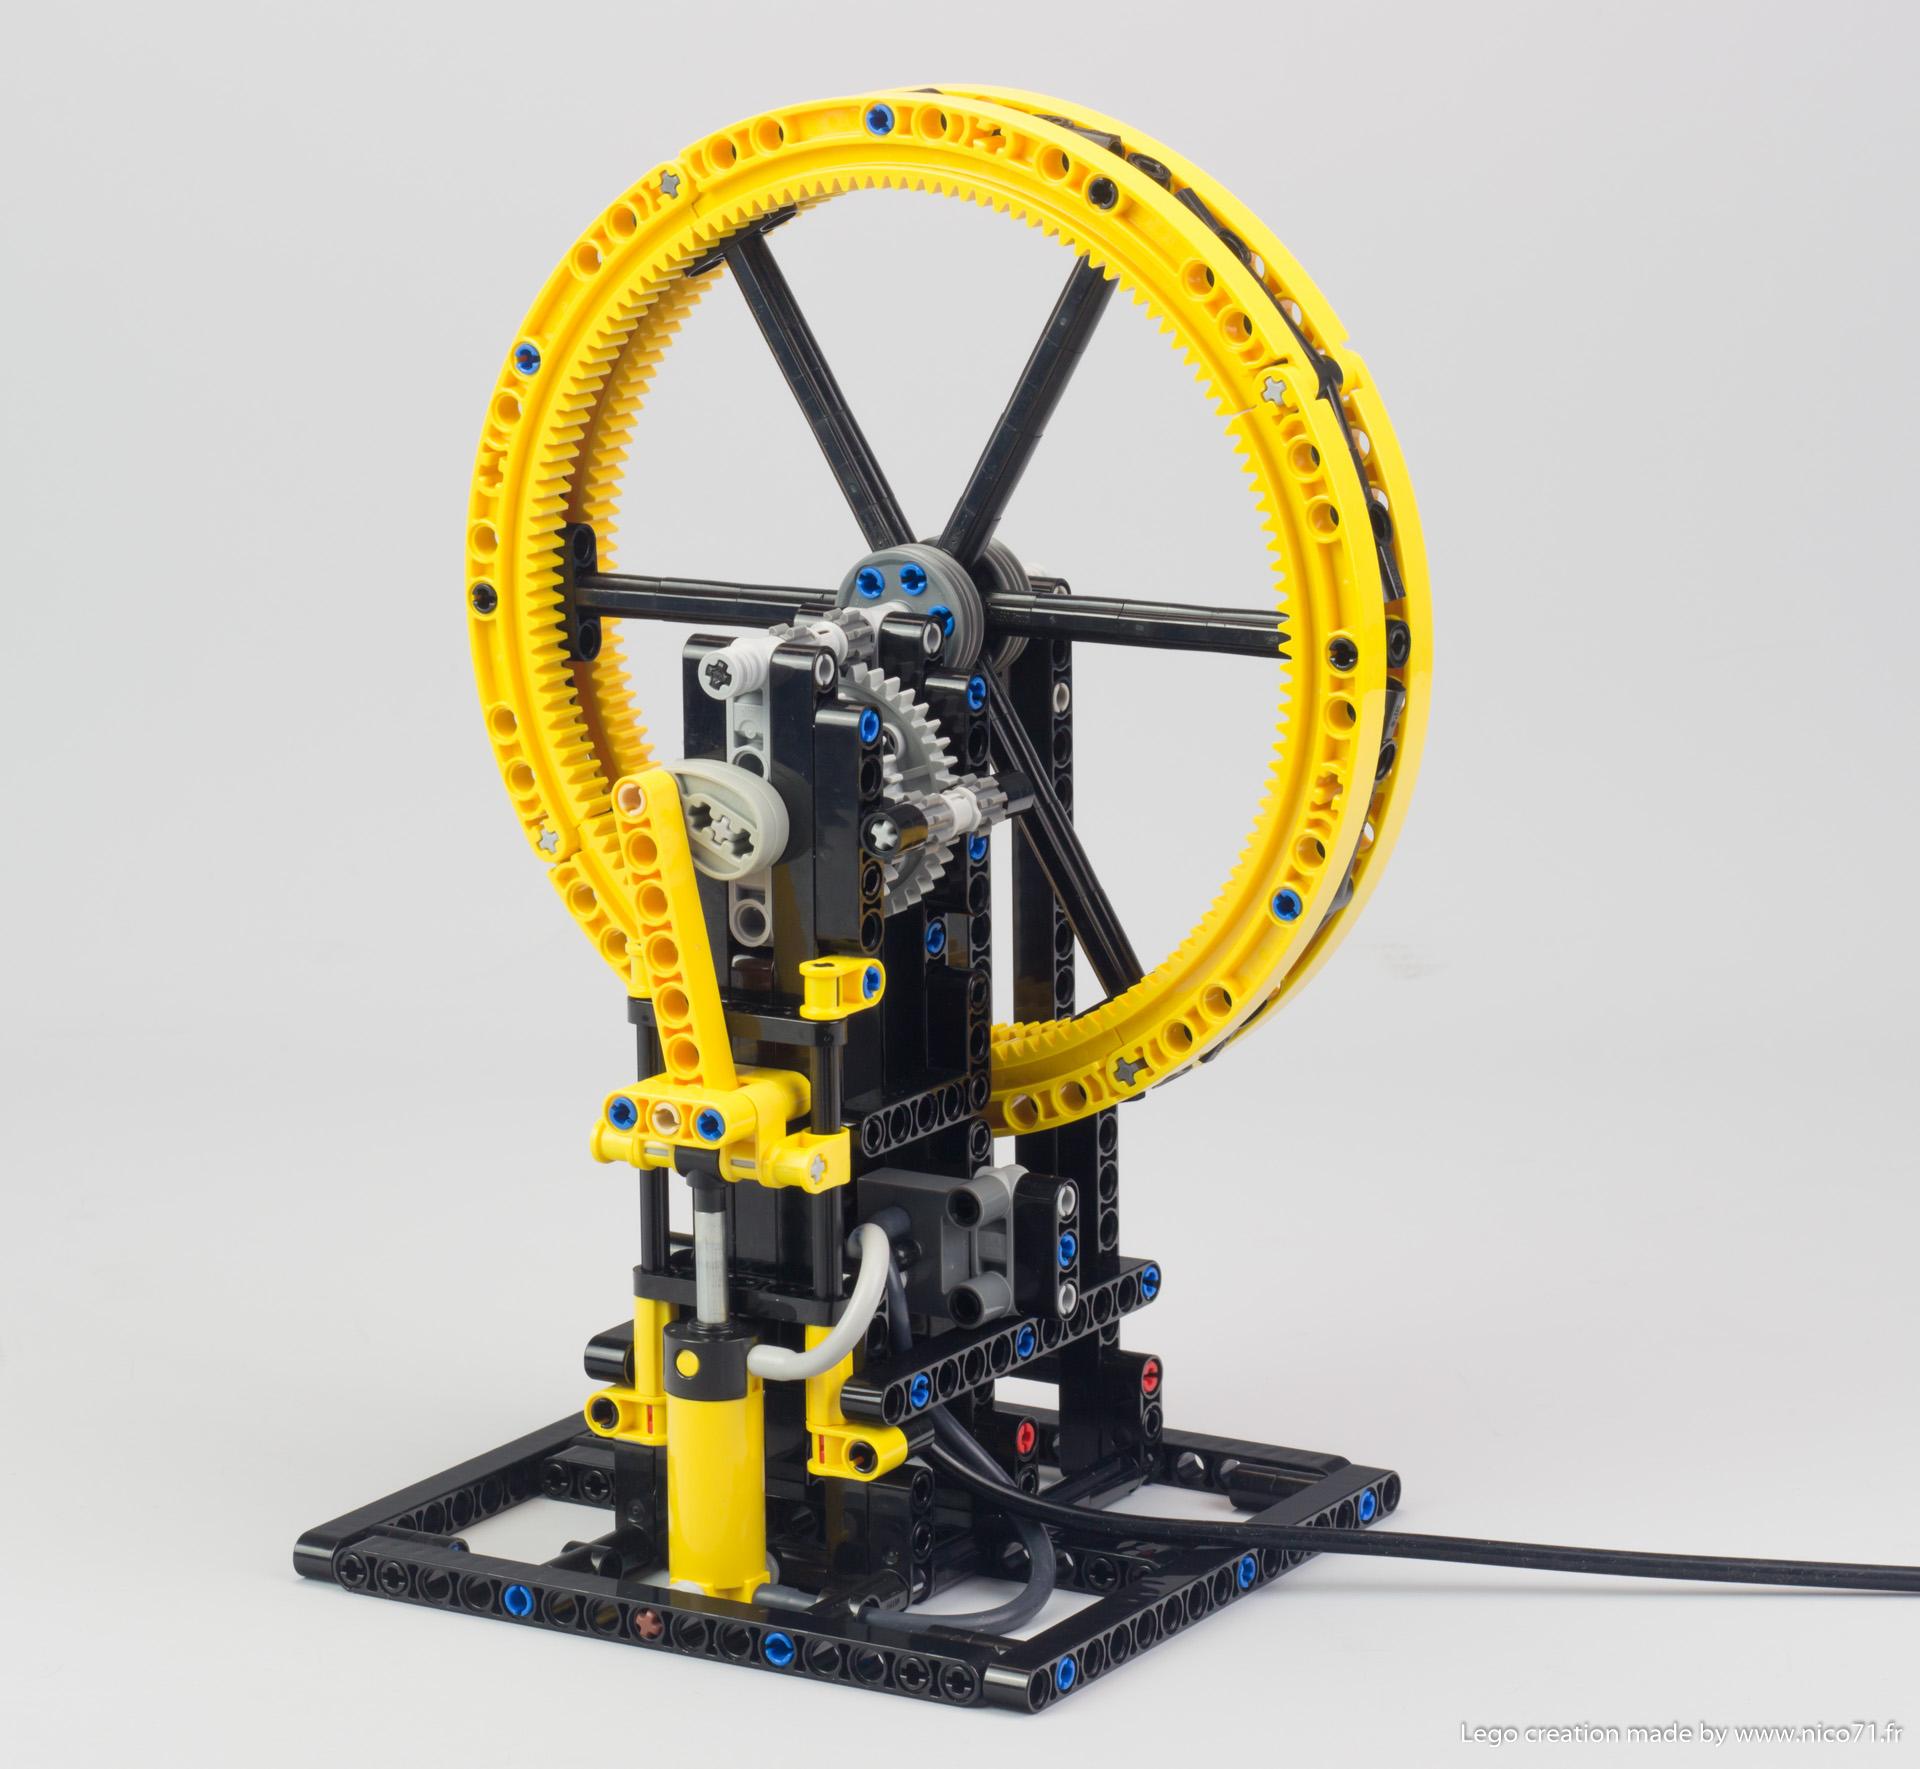 lego-pneumatic-vertical-engine-3